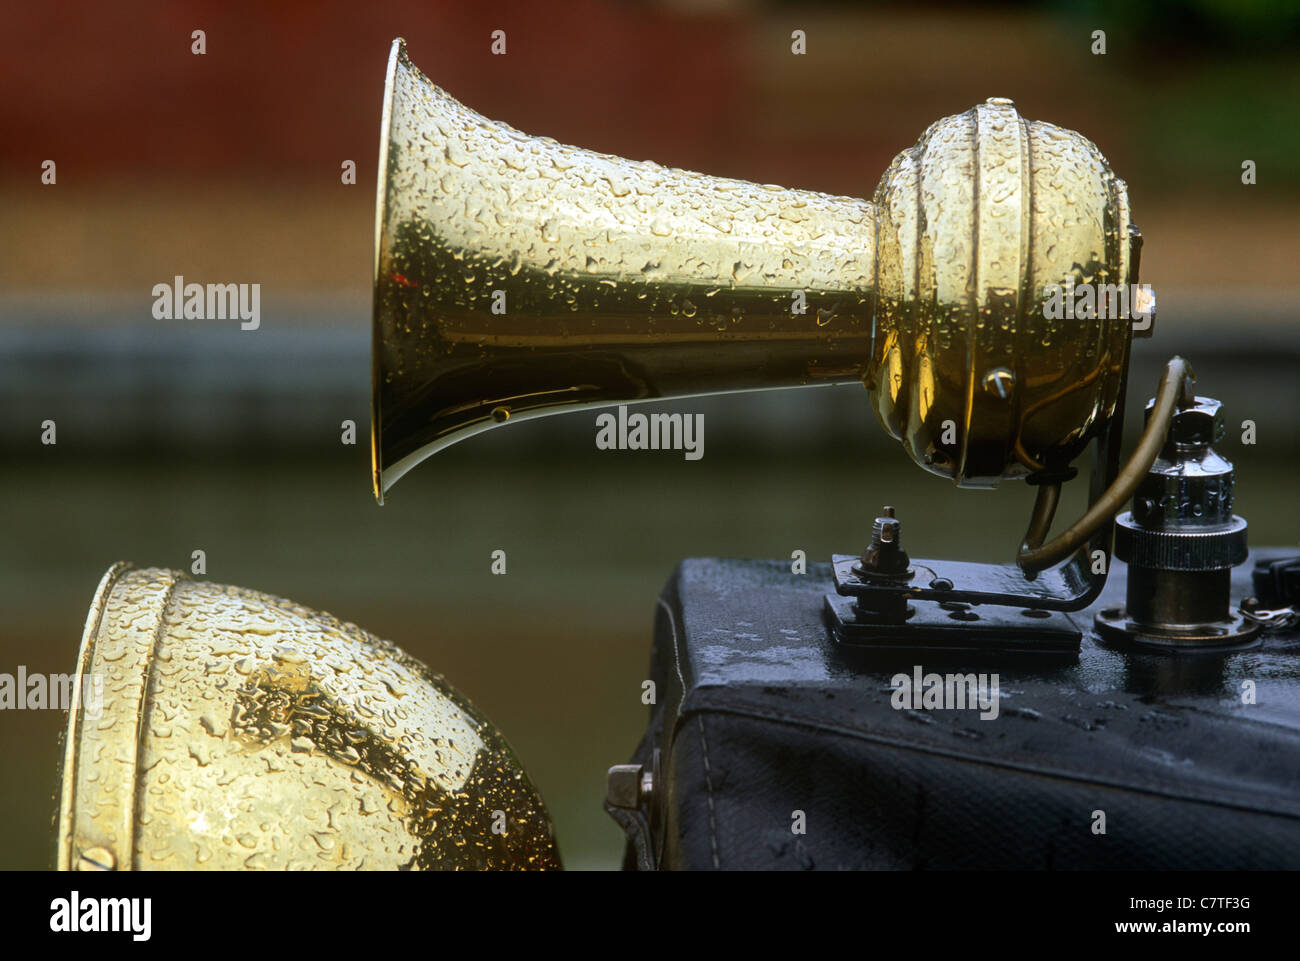 Brass klaxon on narrowboat. Grand Union Canal, Braunston. - Stock Image